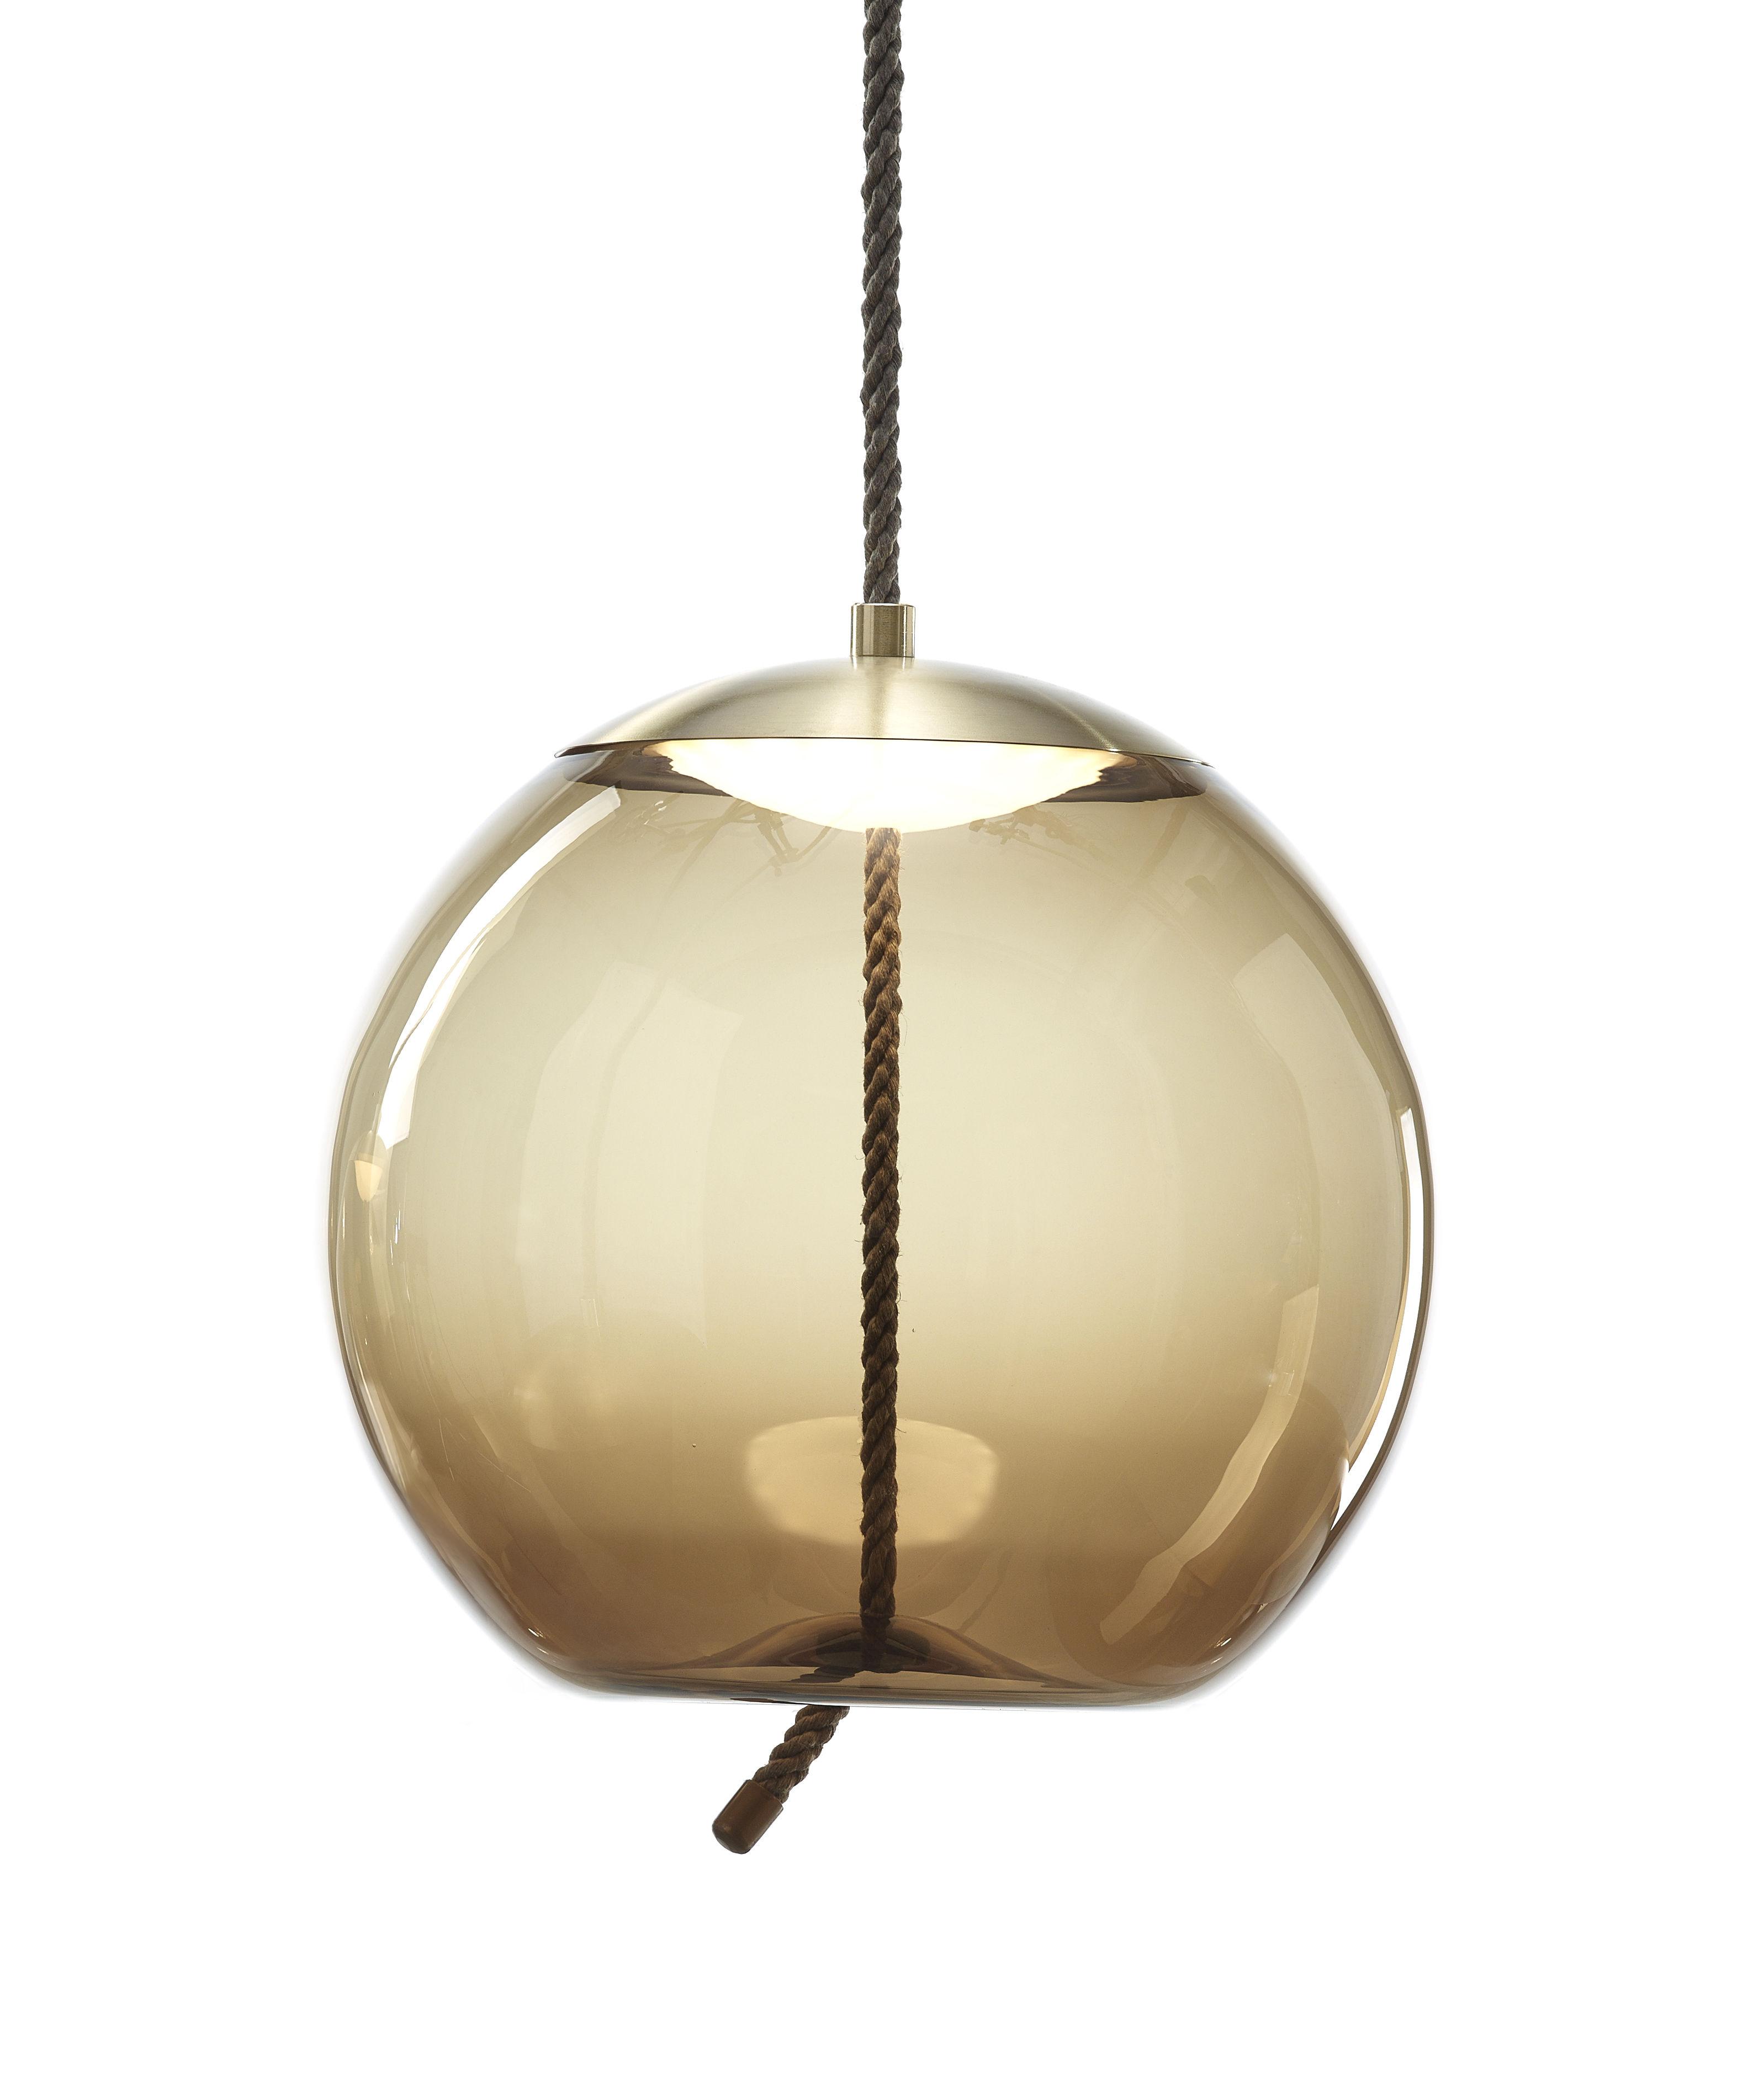 Lighting - Pendant Lighting - Knot sfera Pendant - / Glass & rope - Ø 50 cm by Brokis - Brown / Brass cap - Blown glass, Brass, Natural rope